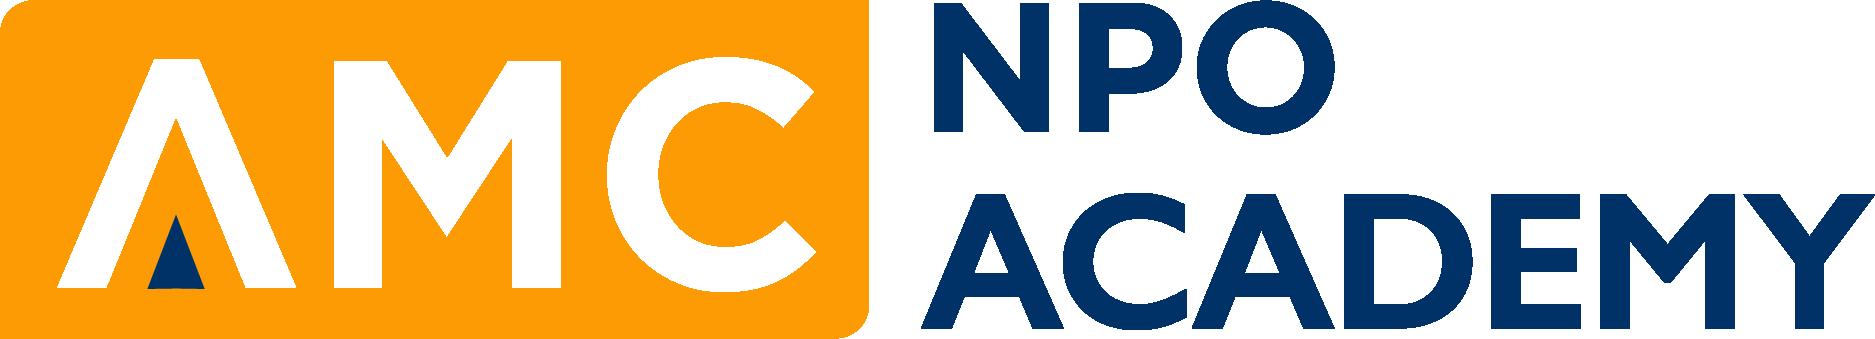 AMC NPO ACADEMY